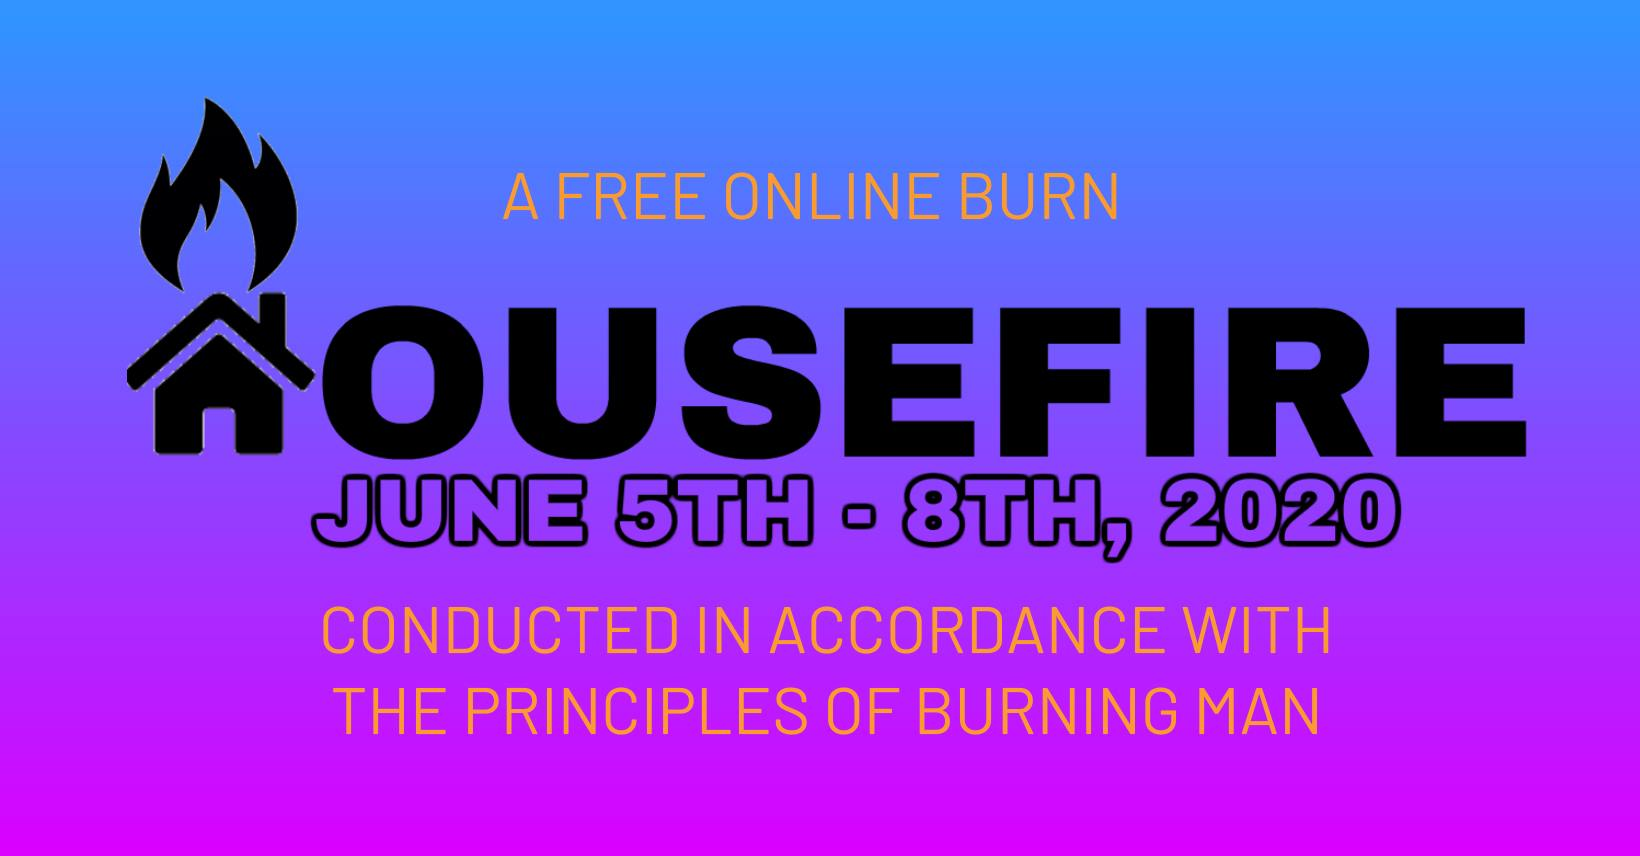 HouseFire 2020